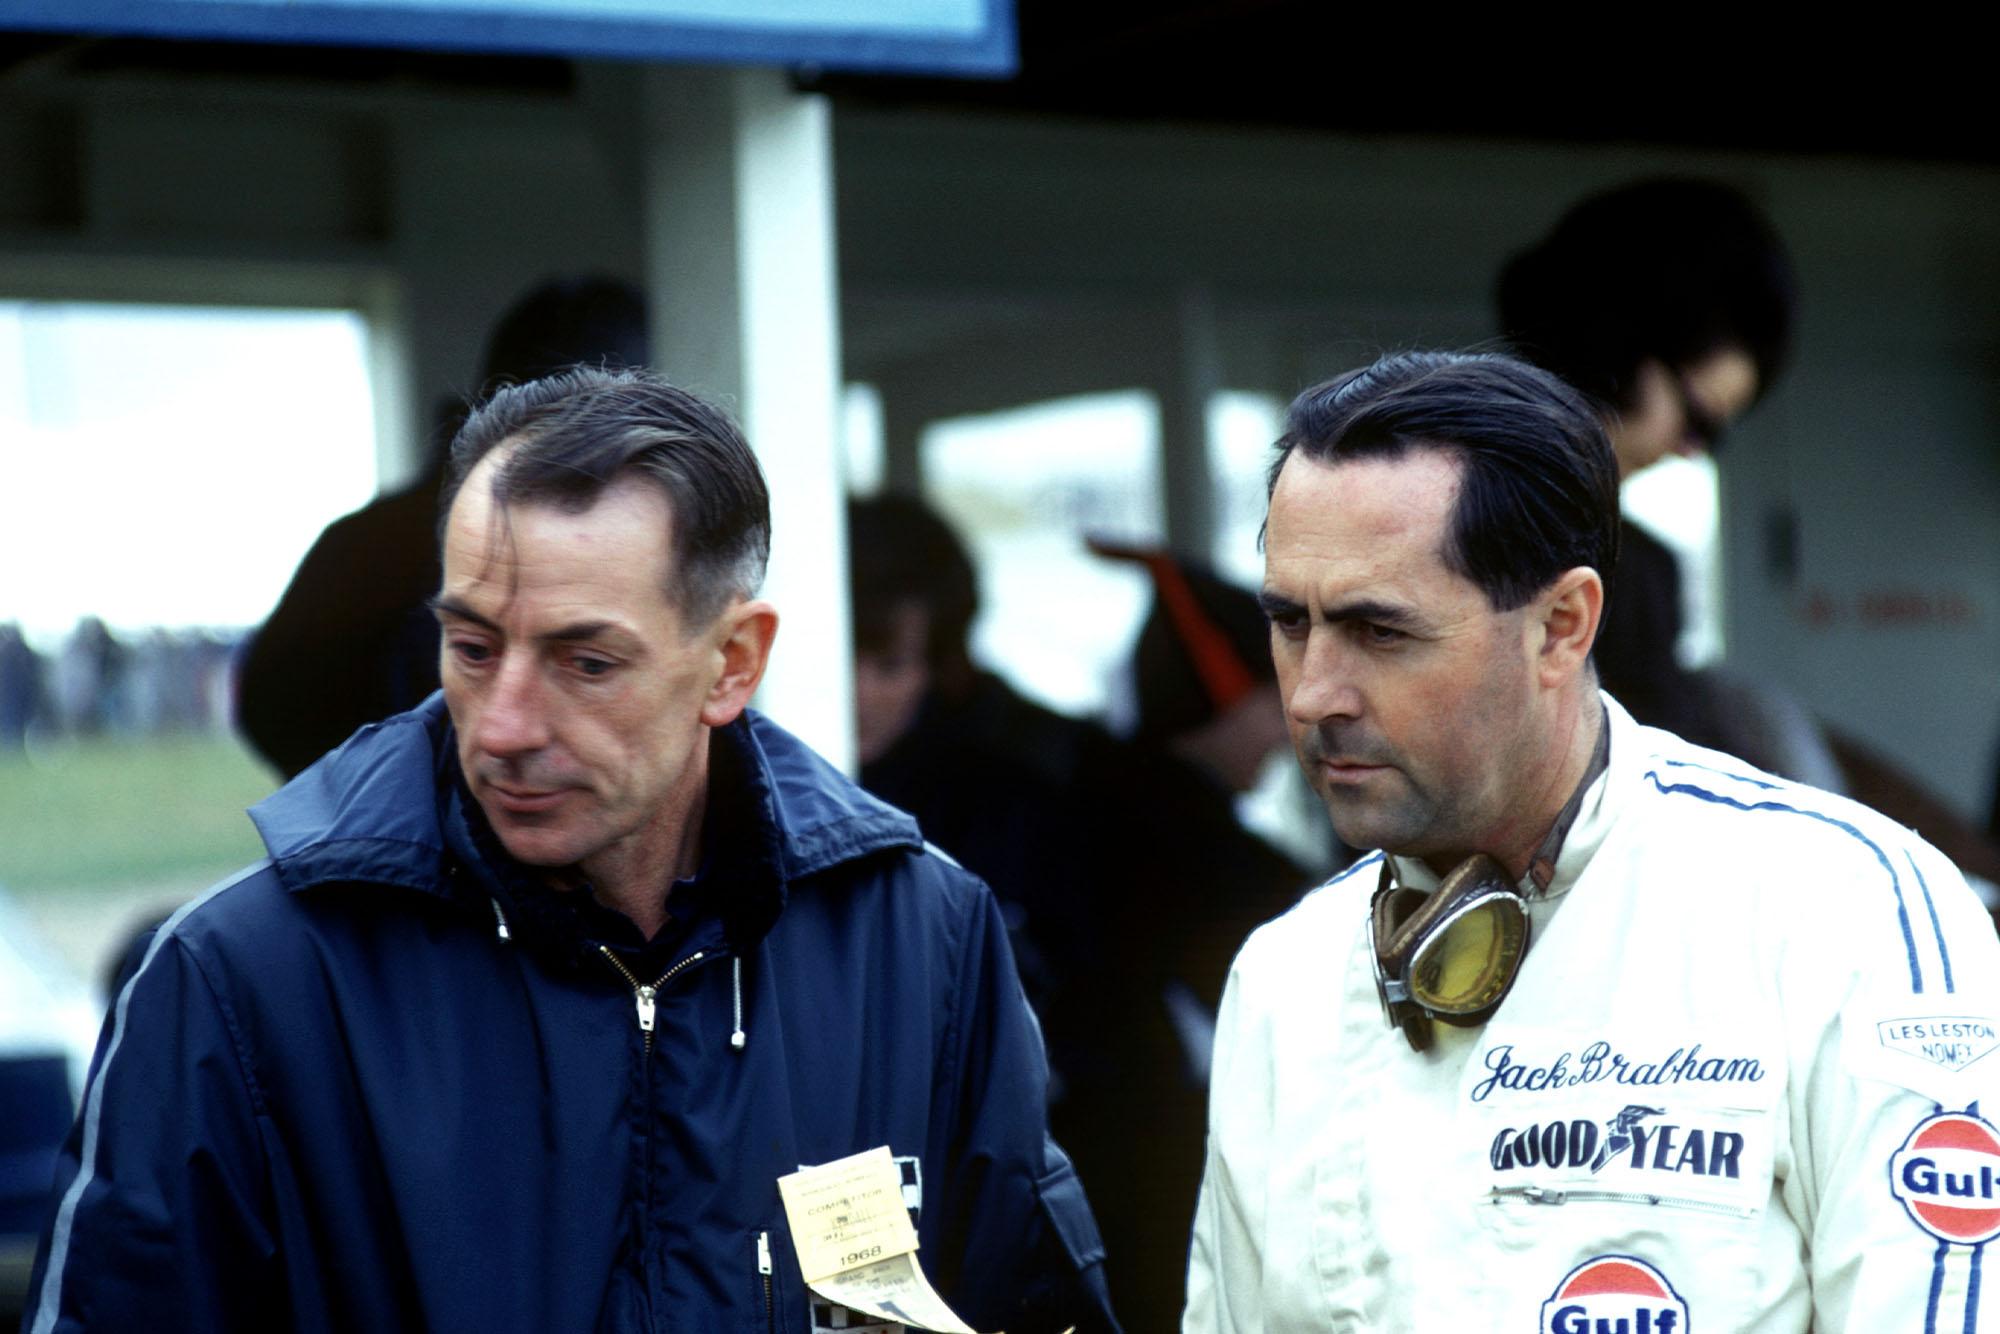 Jack Brabham, right, with his business partner and Brabham car designer Ron Tauranac.